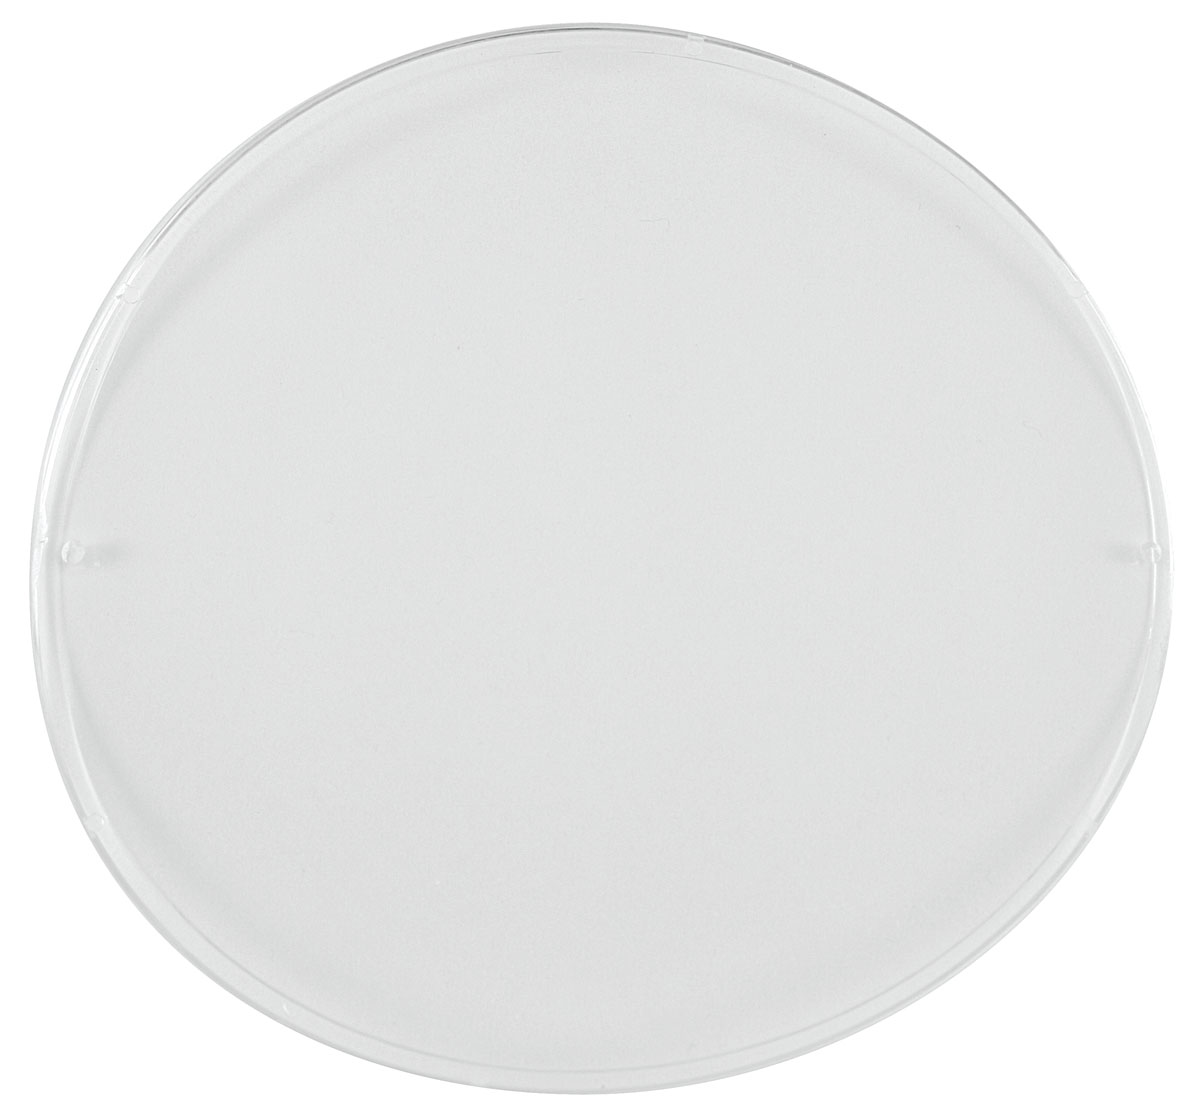 Photo of LeMans Gauge Lens tachometer